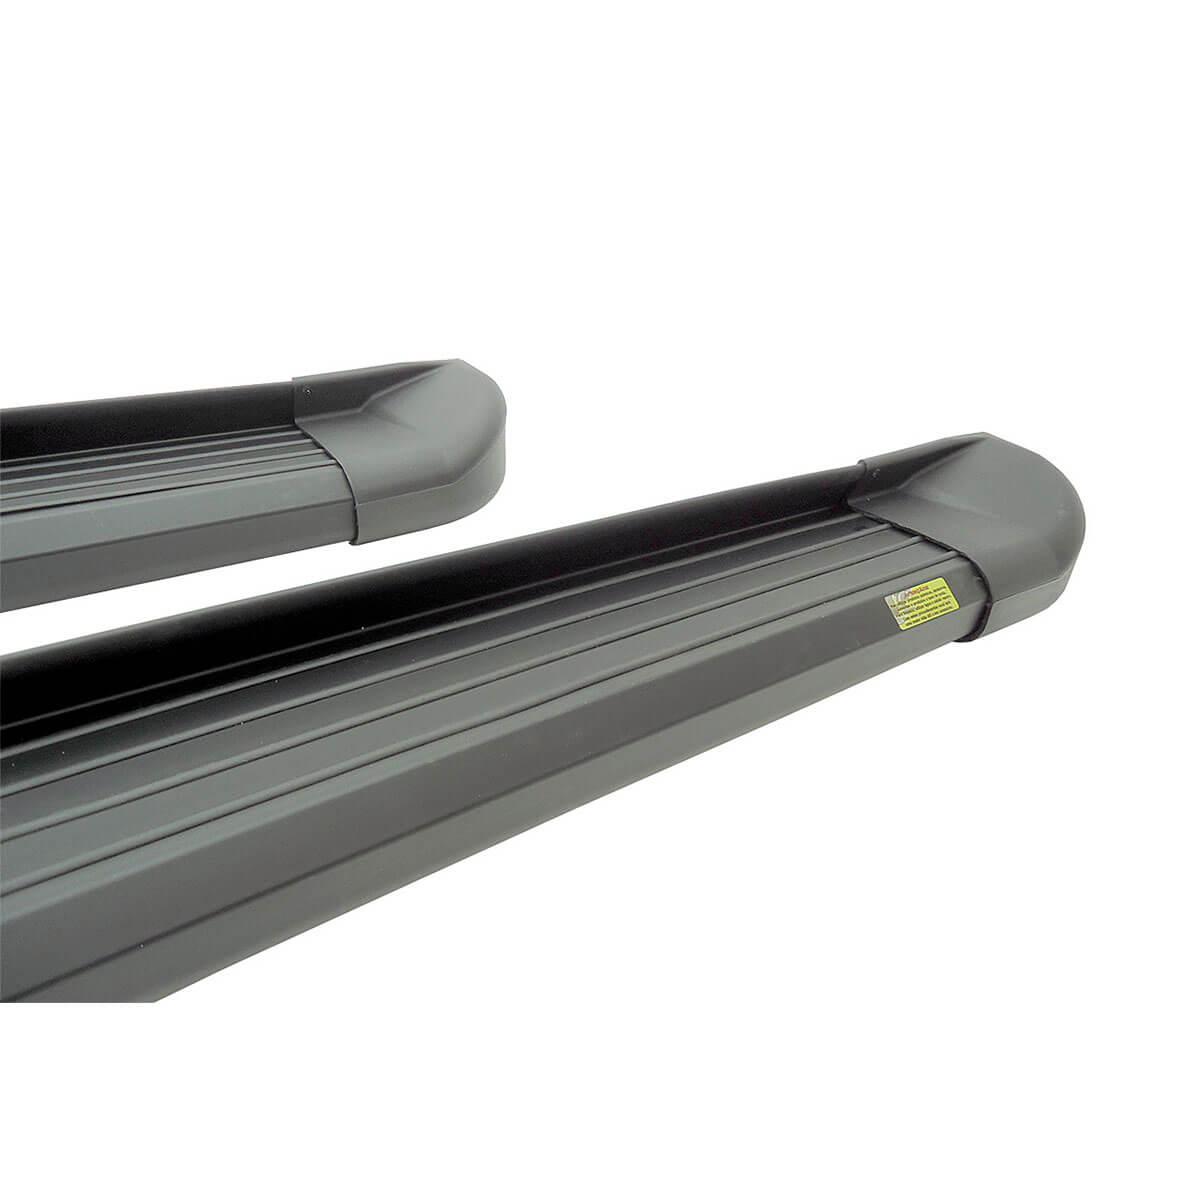 Estribo plataforma alumínio preto L200 Triton 2008 a 2018